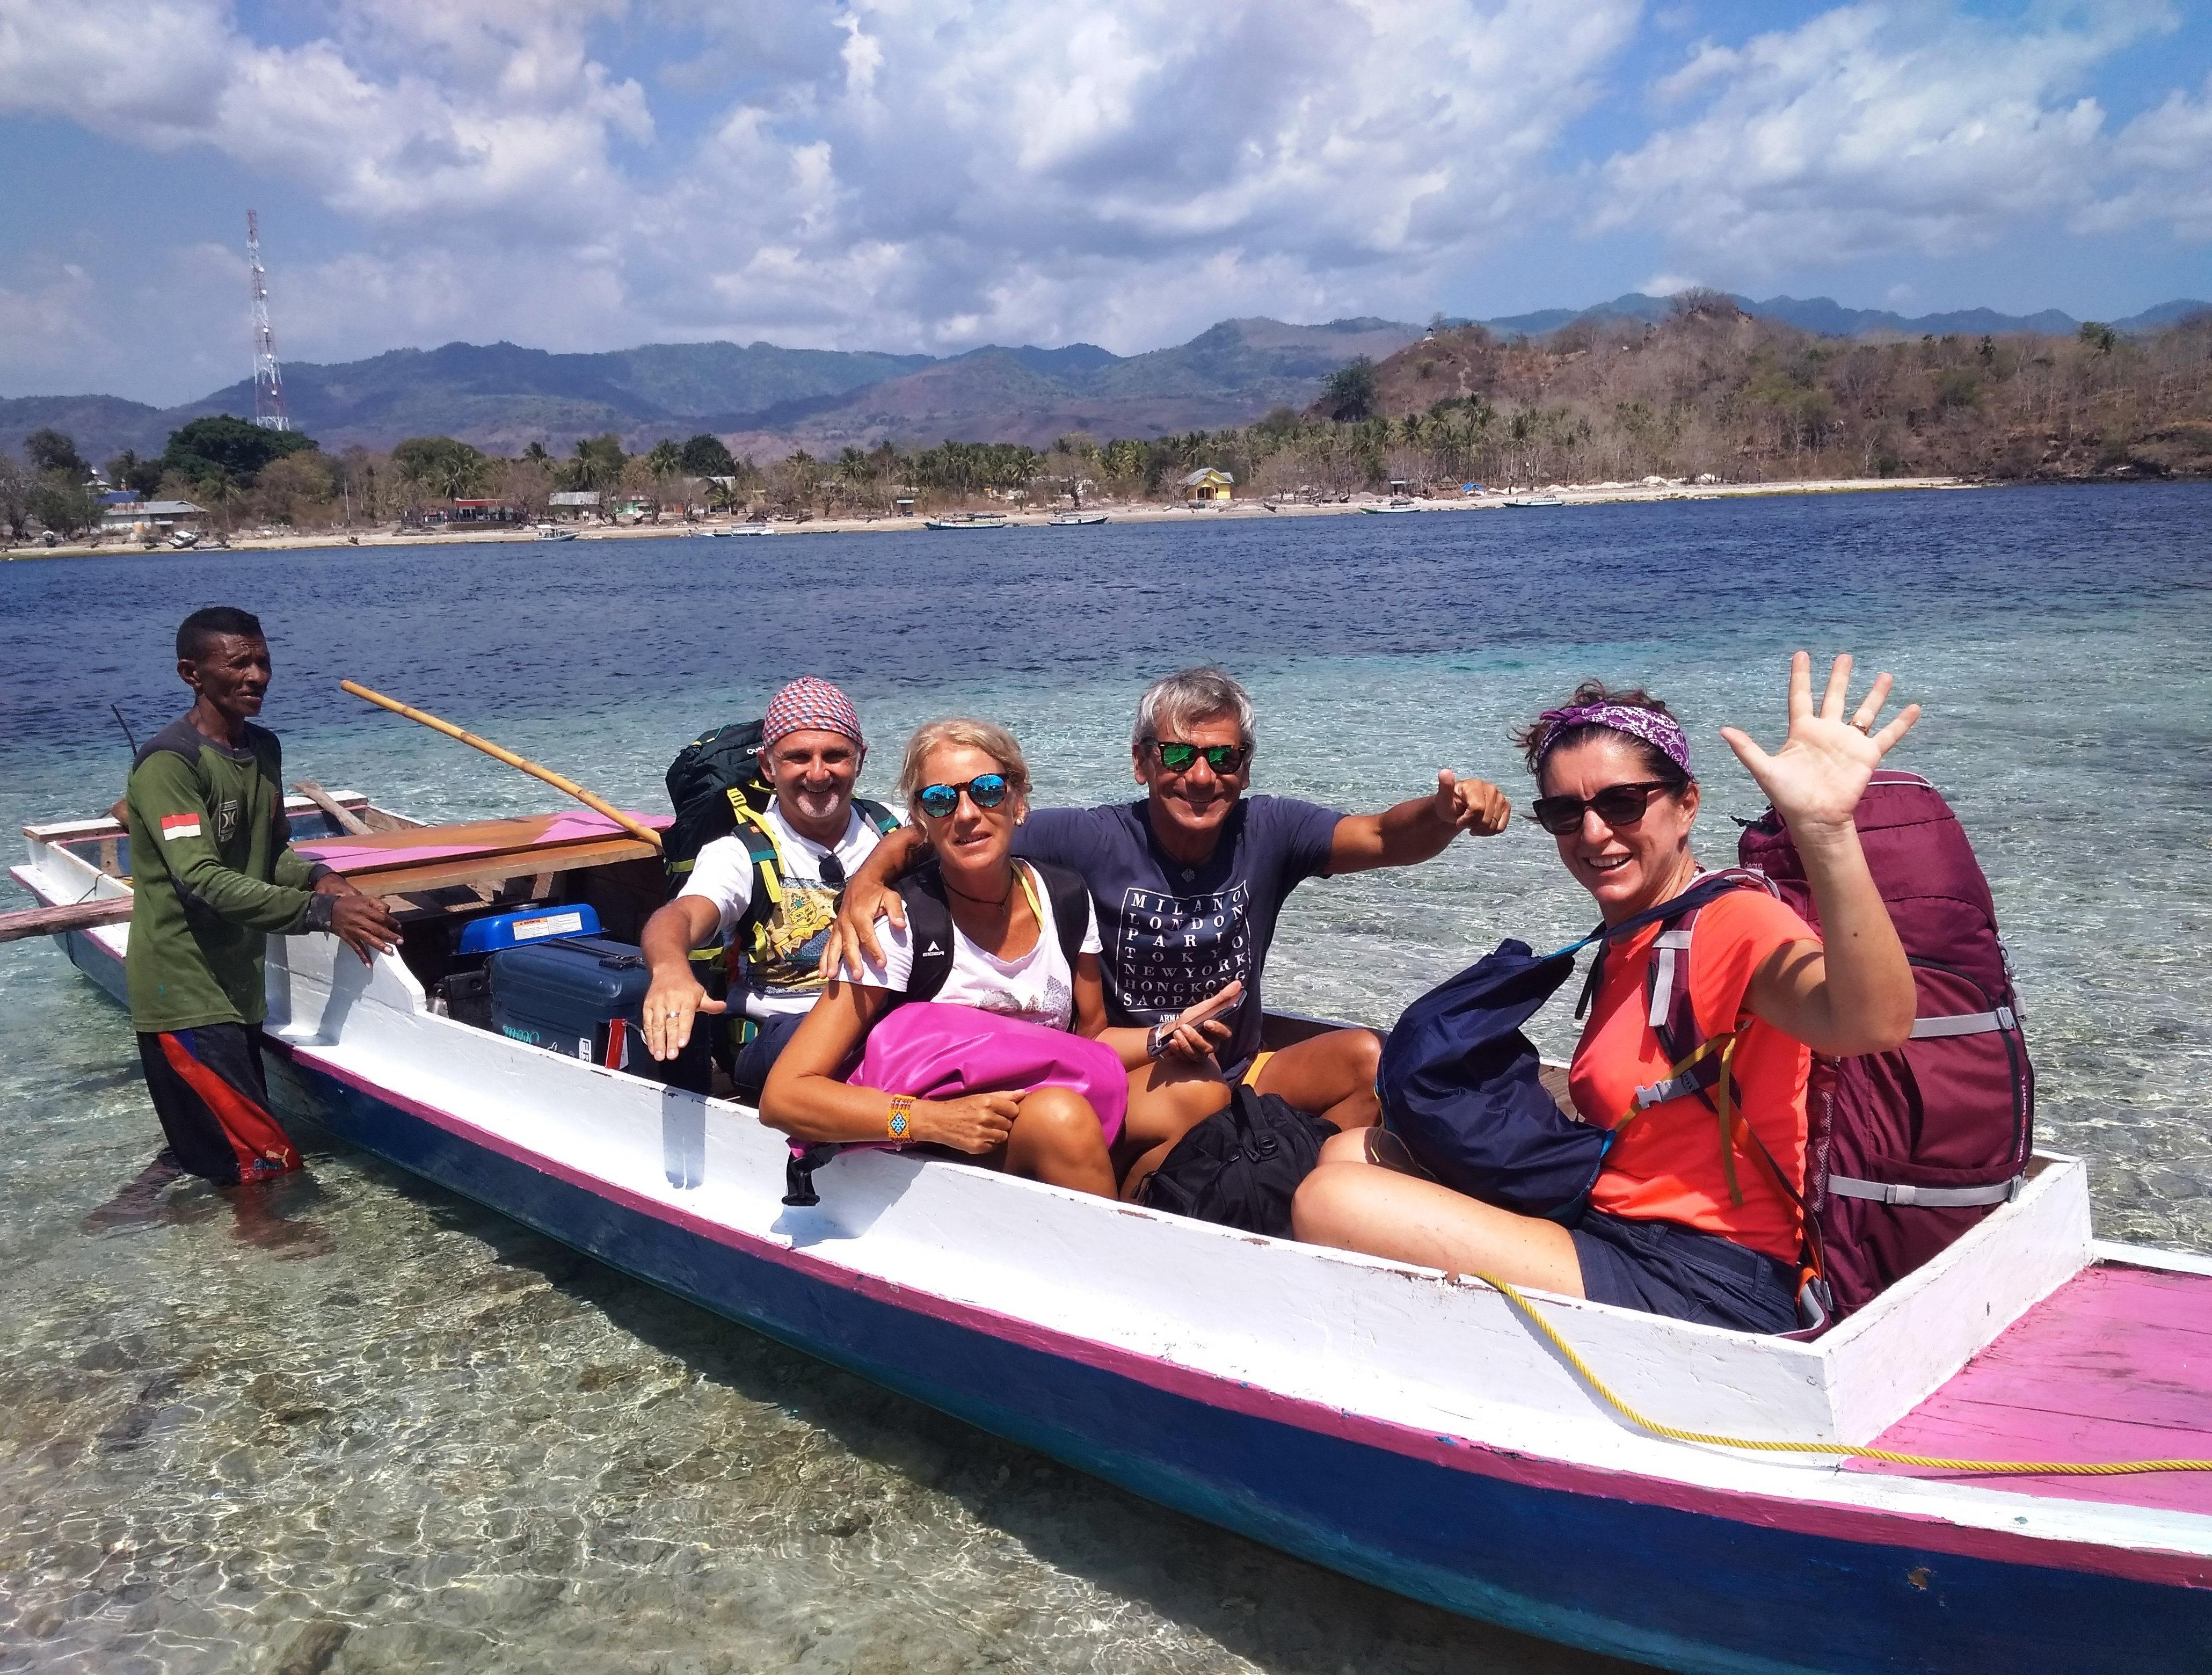 viaggiare insieme in barca a kepa